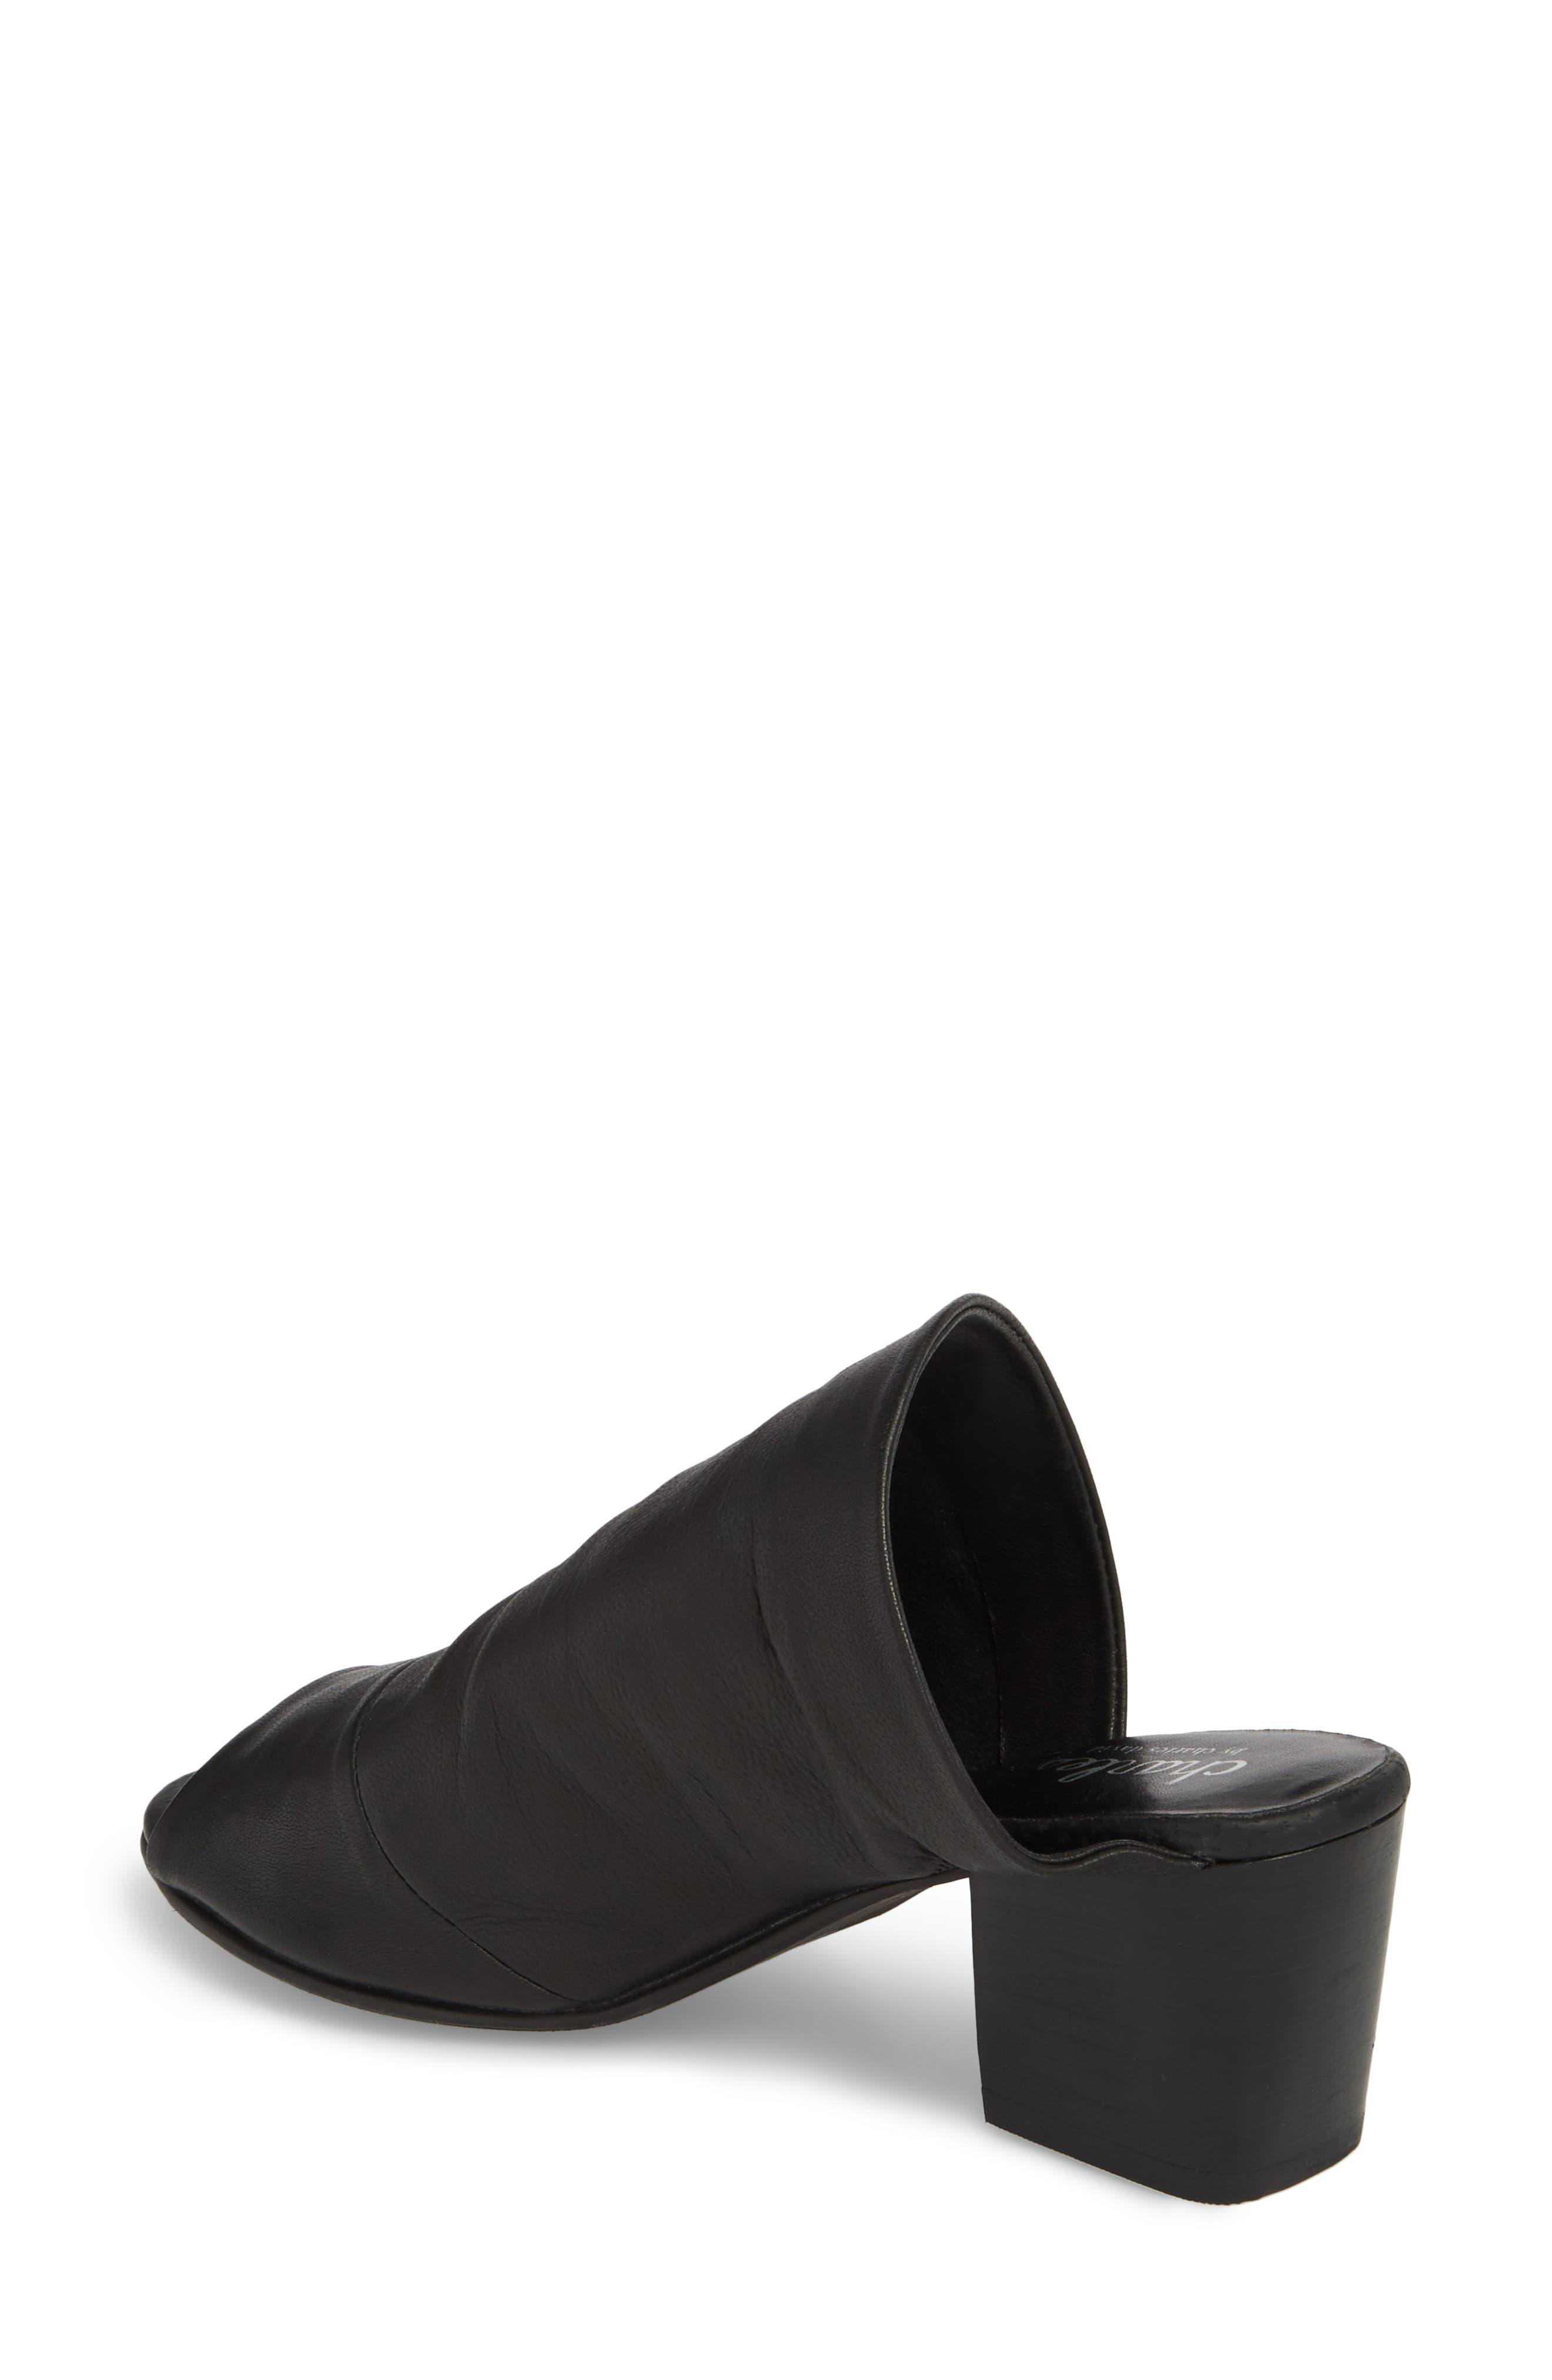 Yanna Block Heel Slide Sandal,                             Alternate thumbnail 2, color,                             BLACK LEATHER